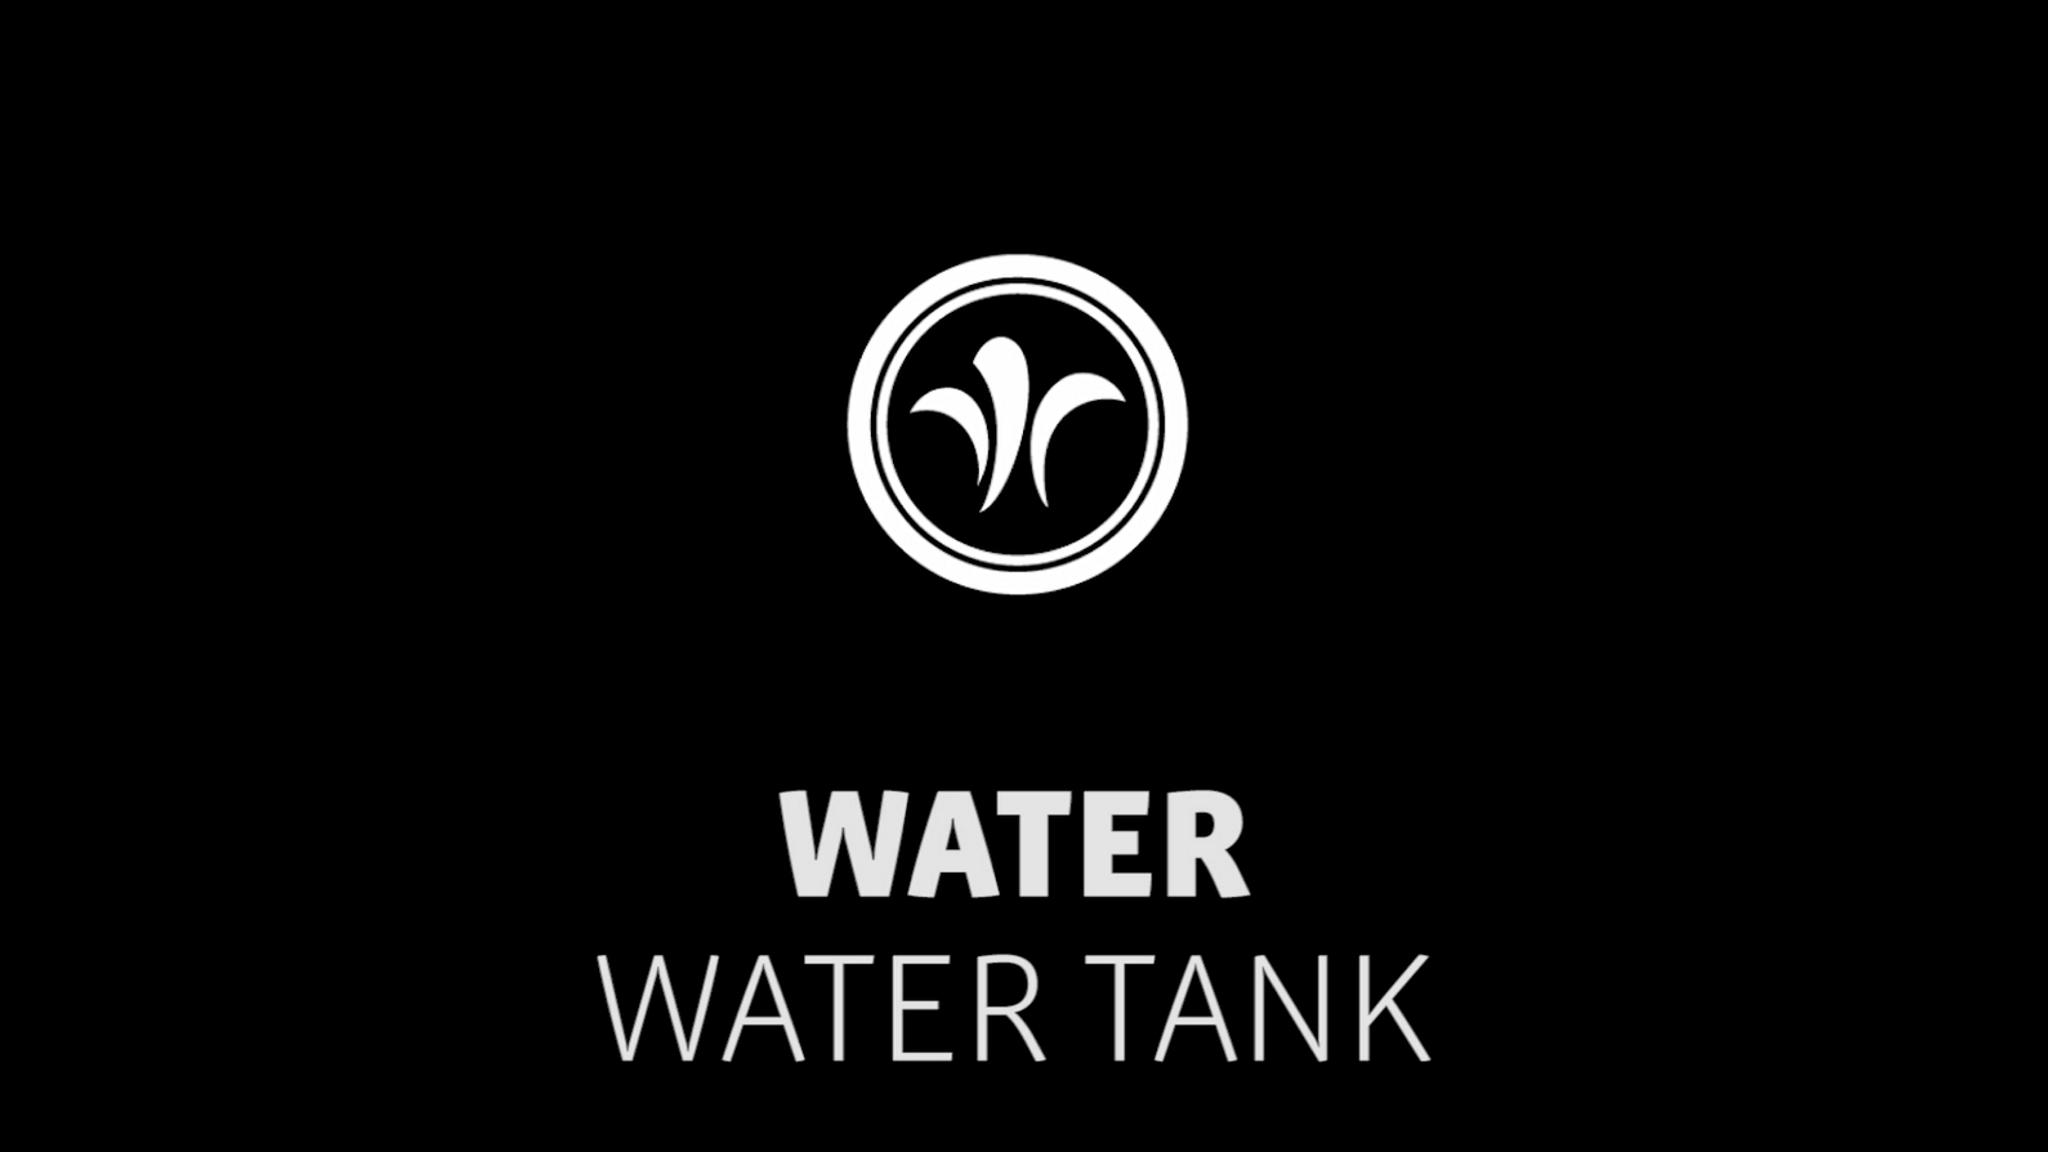 motorhome water tank // niesmann+bischoff - camper (model ARTO) // 2019 // WA1